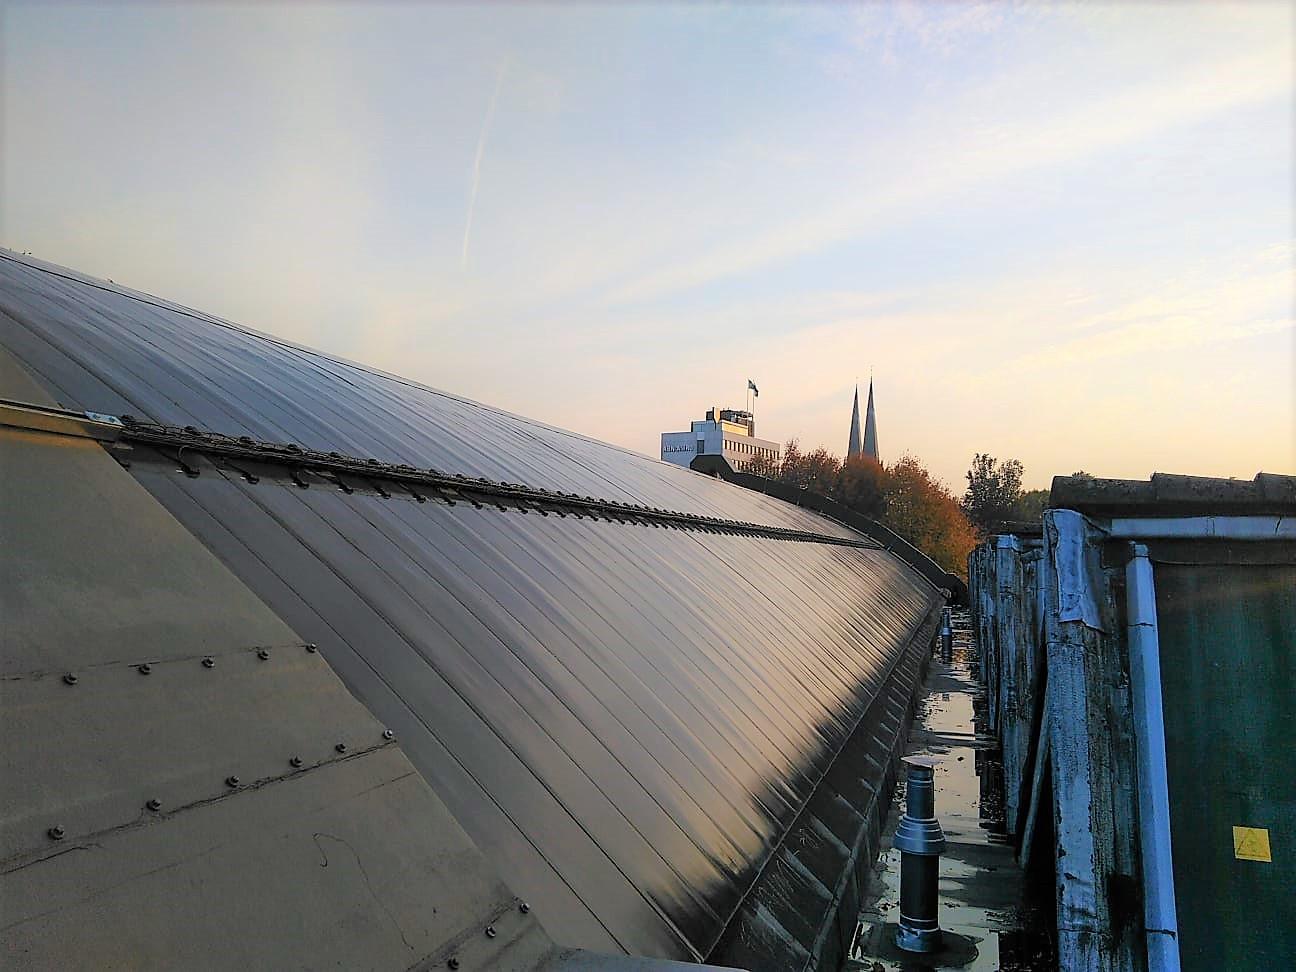 Installation in the Netherlads